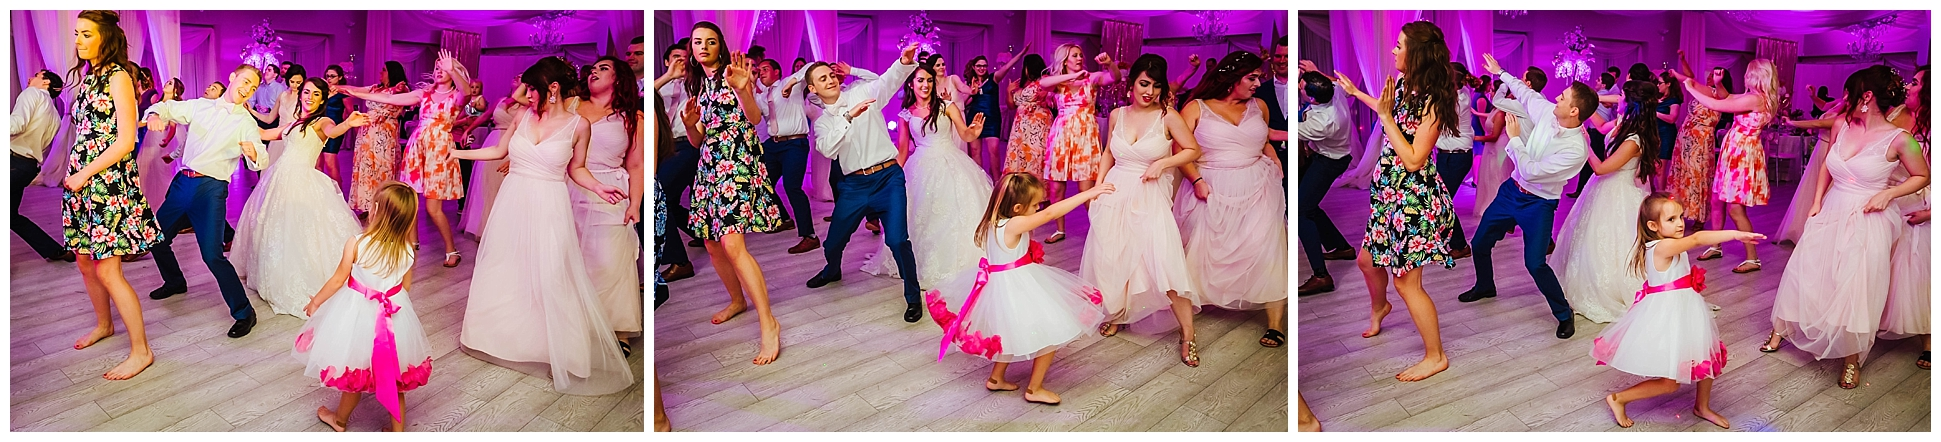 st-pete-wedding-photographer-sunken-gardens-crystal-ballroom-princess-dancer_0209.jpg